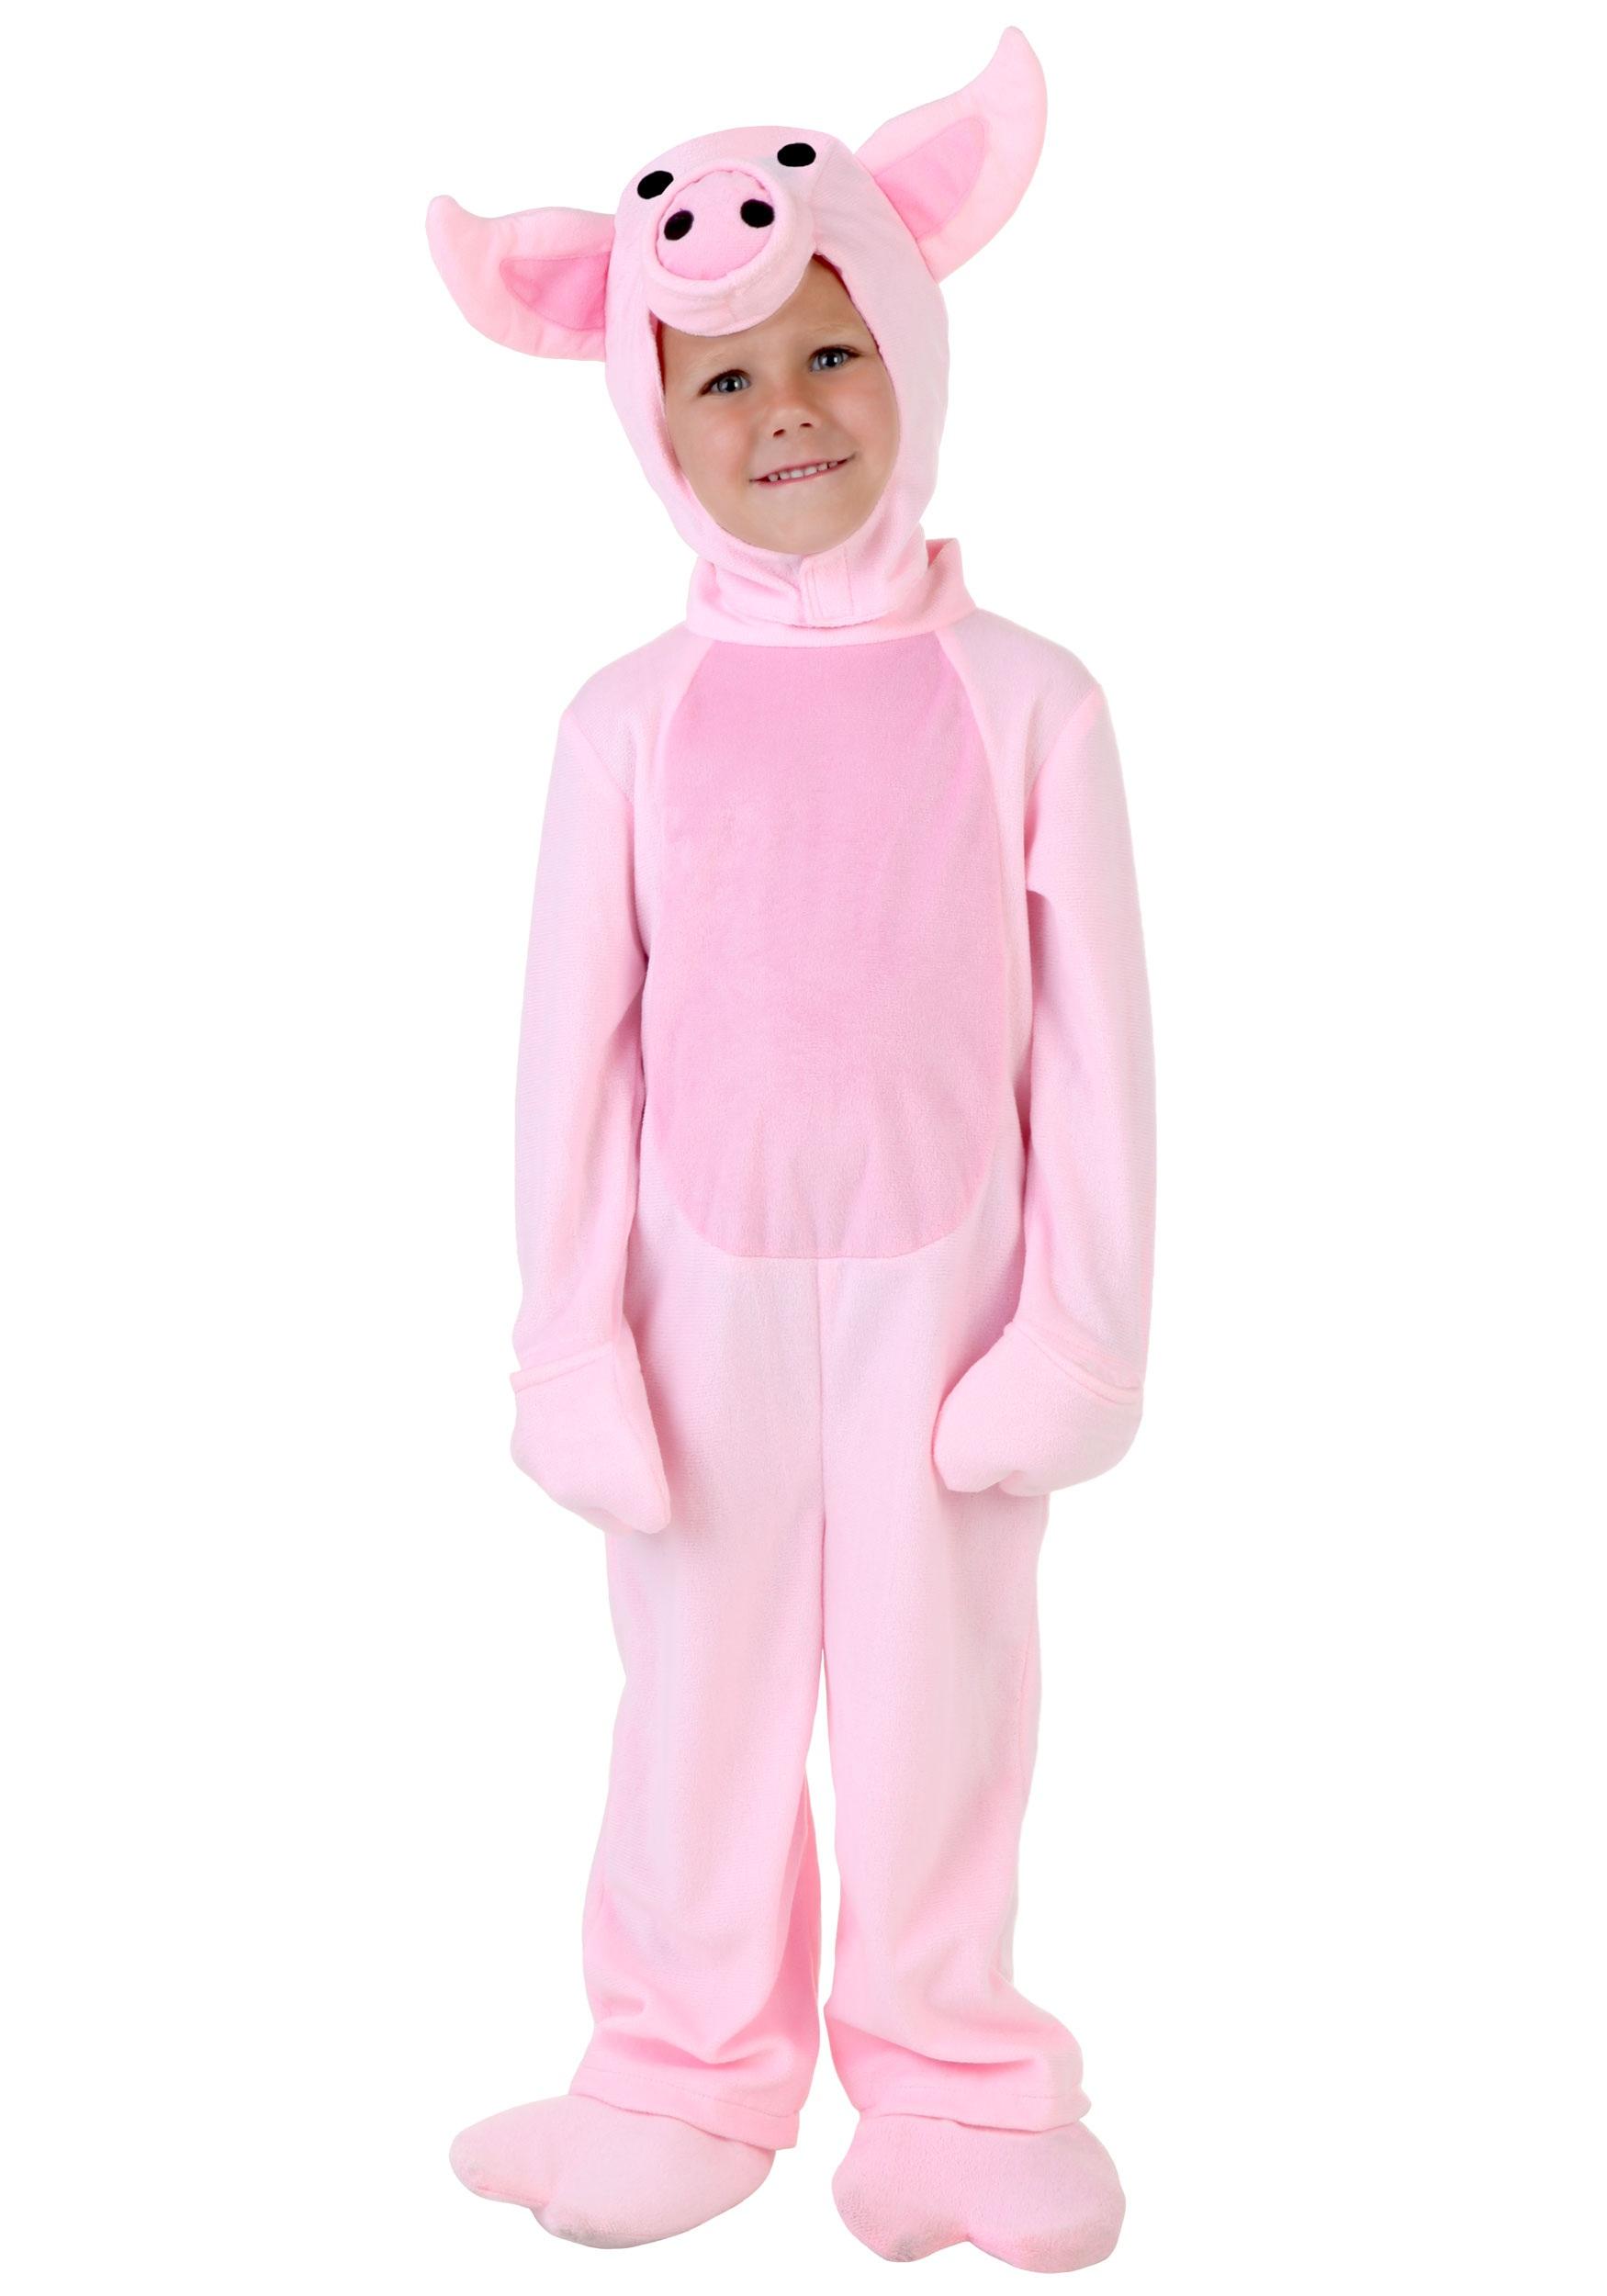 Small Child Pig Costume | Farm Animal Costume | Exclusive